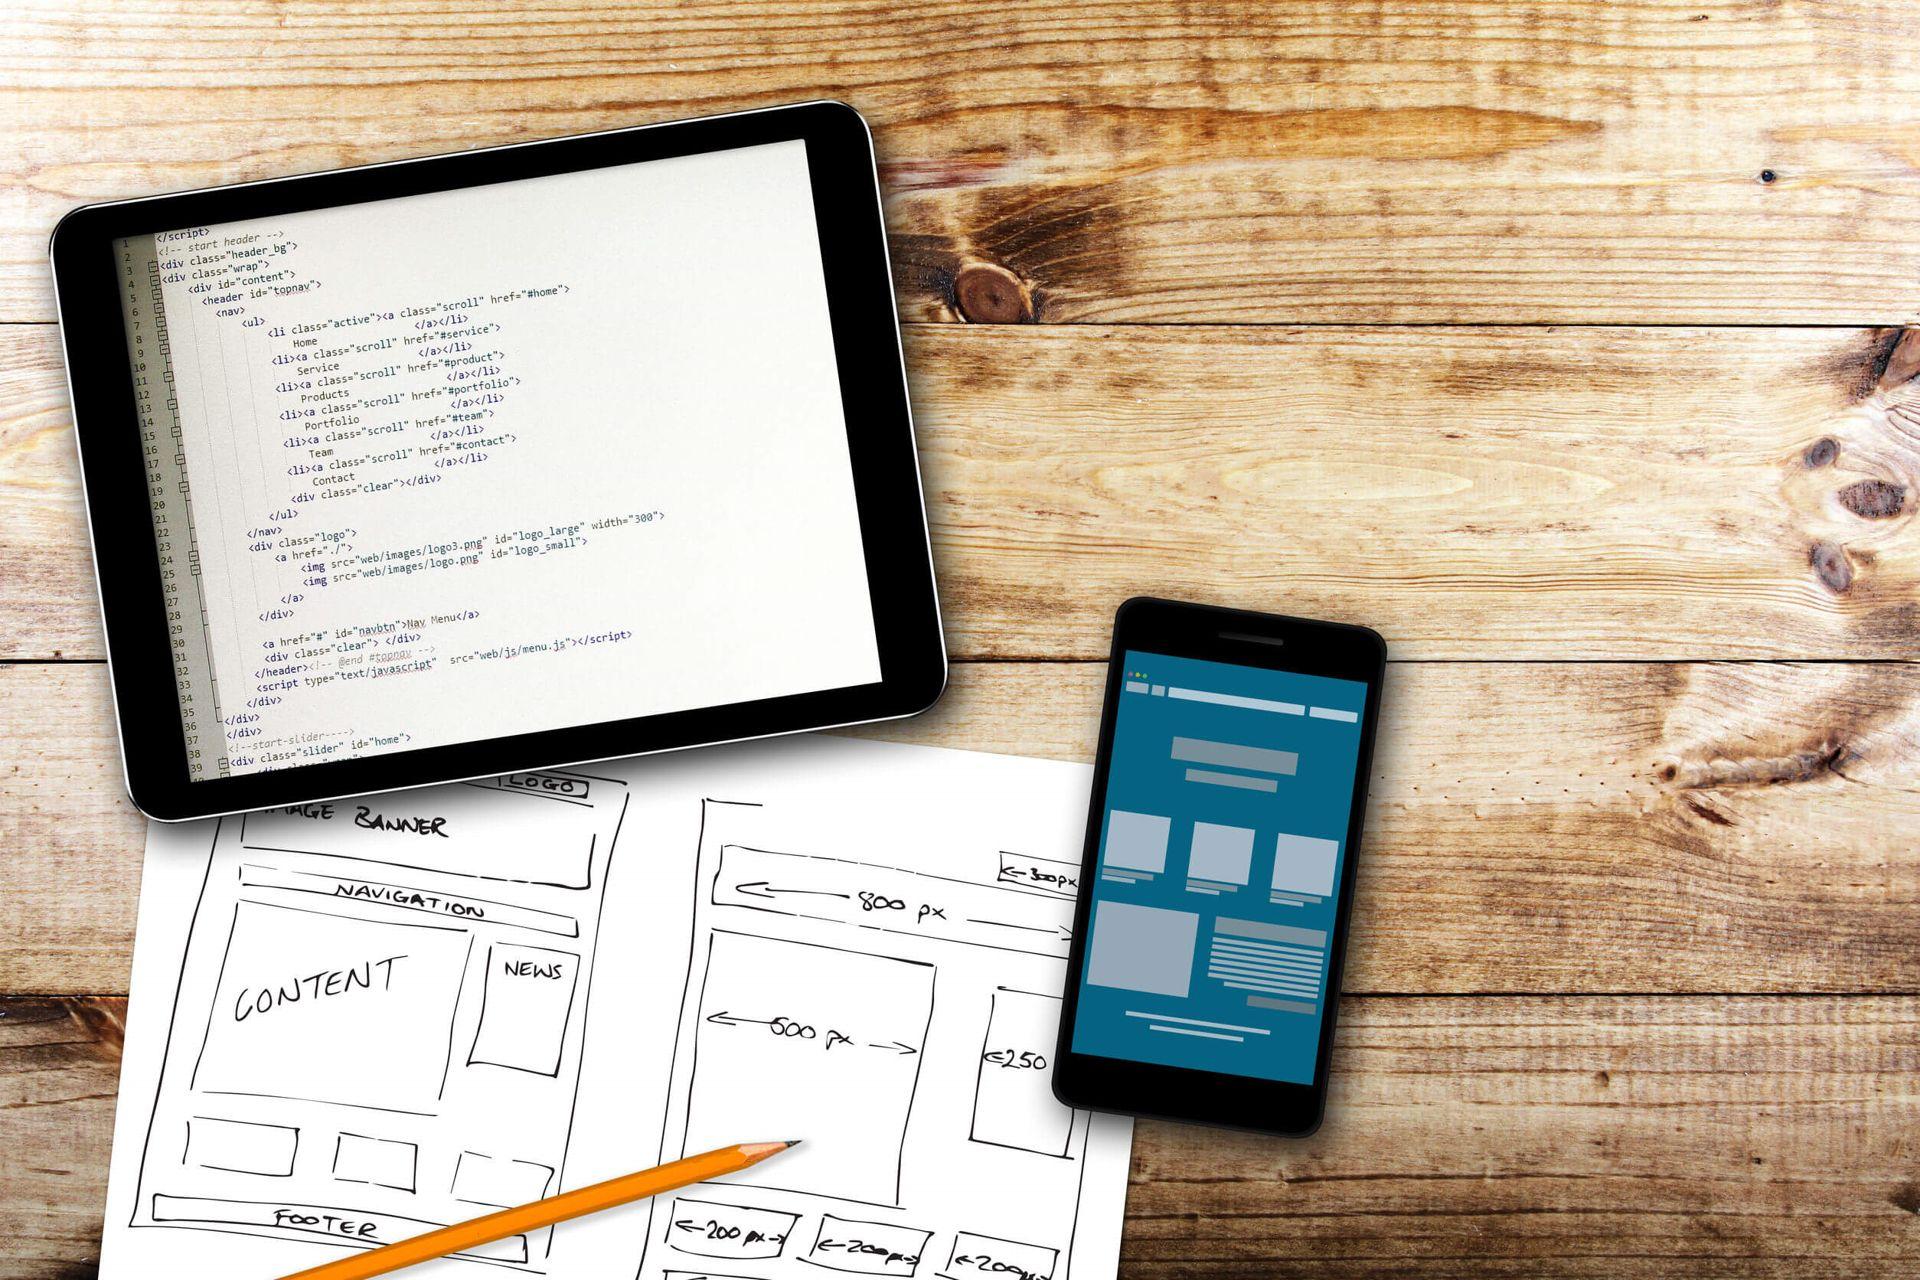 Diseño web responsive es Viladecans